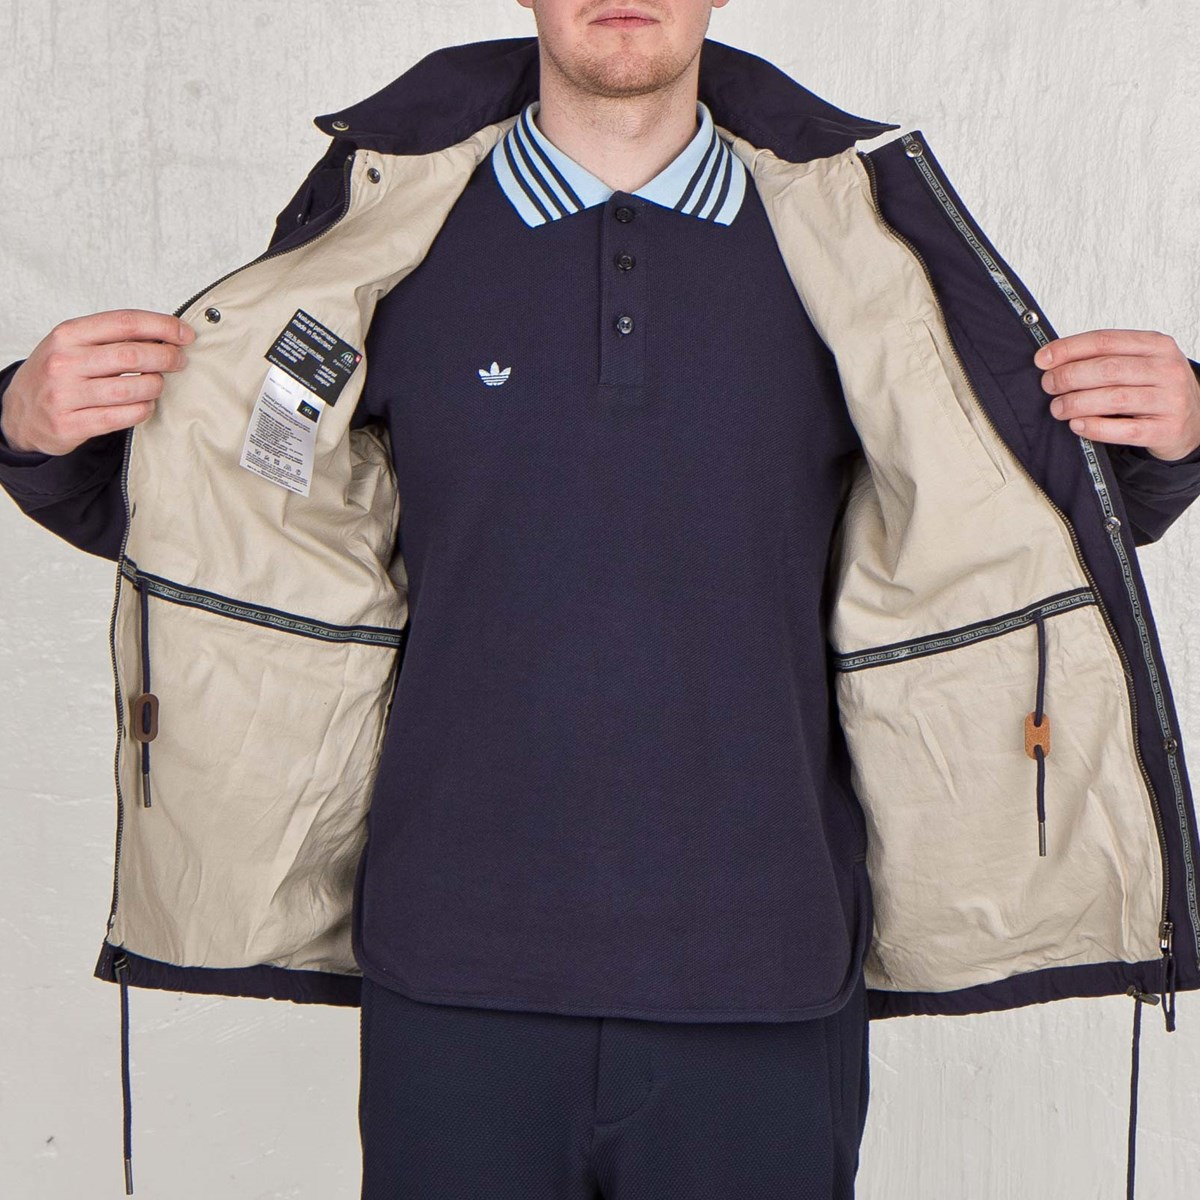 Adidas Haslingden Jacket Spzl S07190 Sneakersnstuff Sneakers Streetwear Online Since 1999